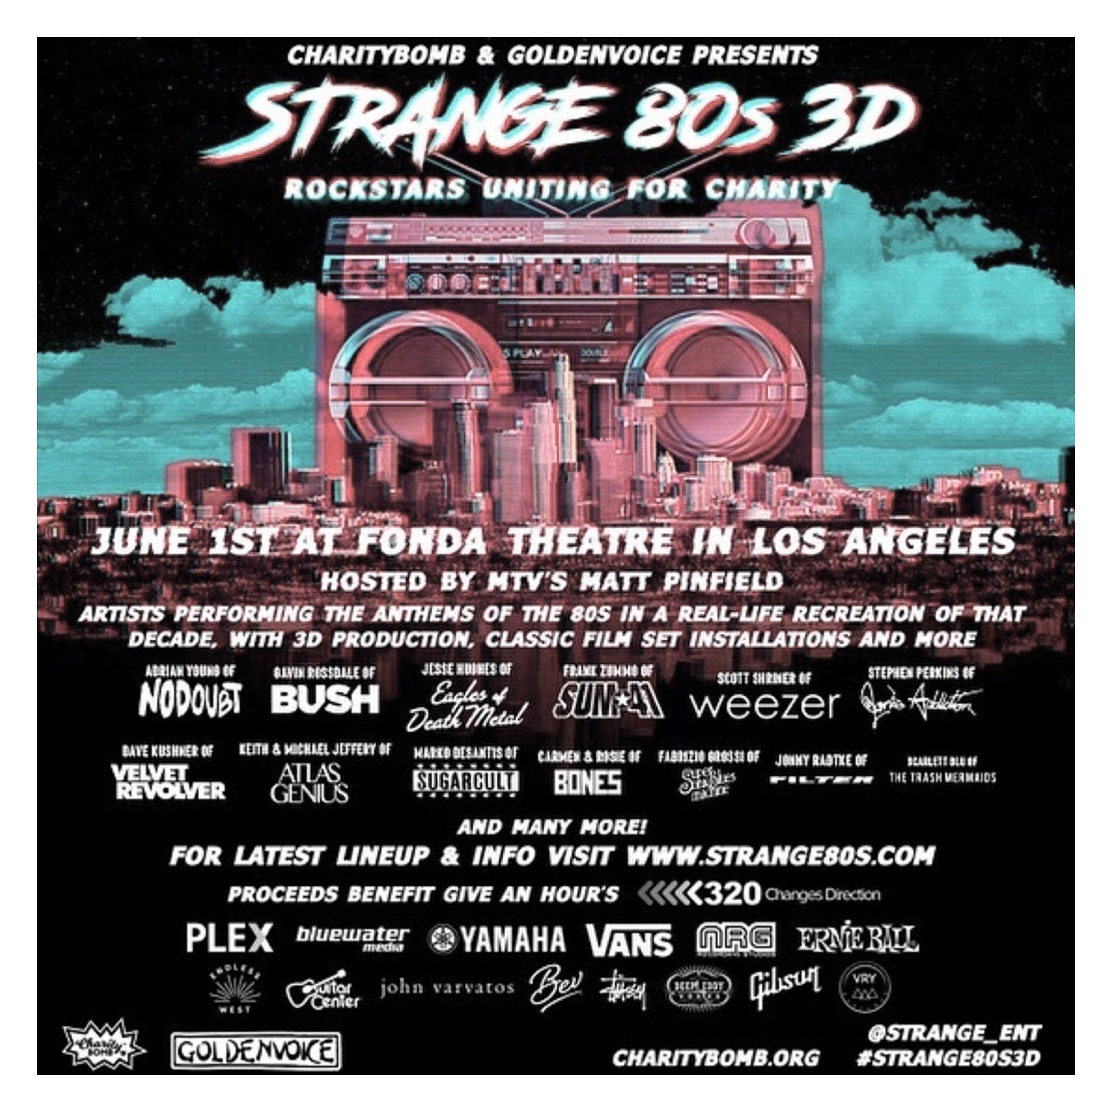 Rynda joins Charity Bomb Advisory Board  + Strange 80's 3D!